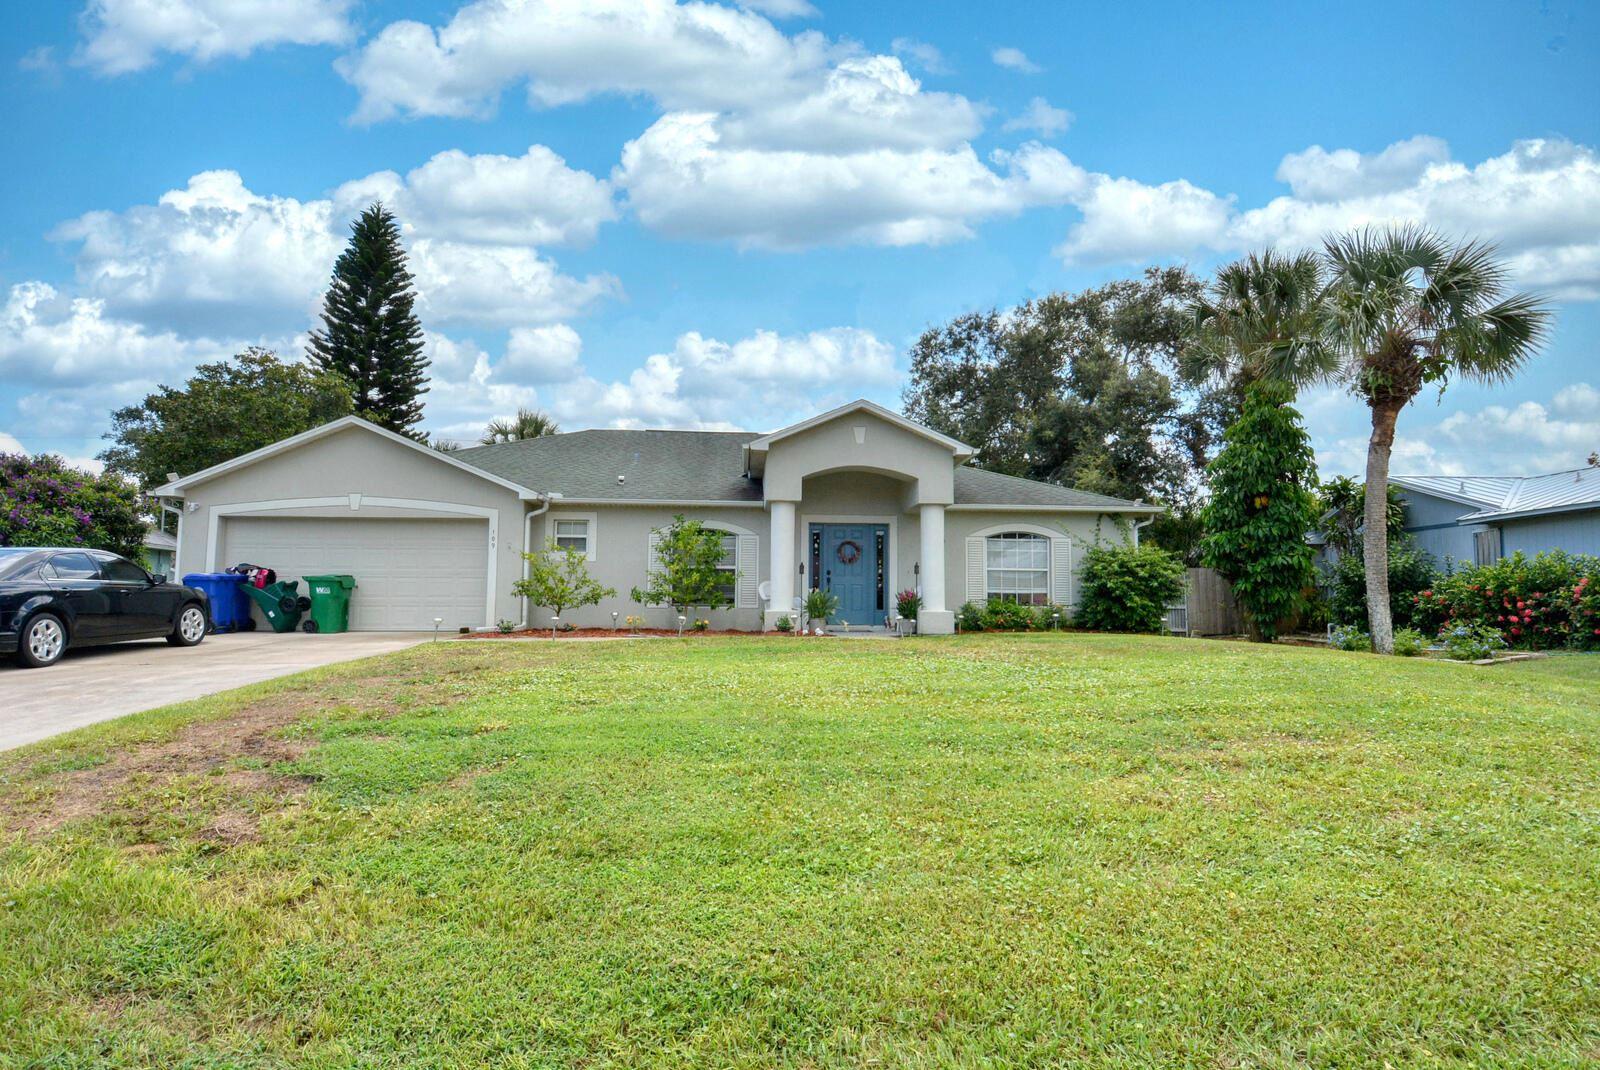 Photo of 109 Redgrave Drive, Sebastian, FL 32958 (MLS # RX-10743827)